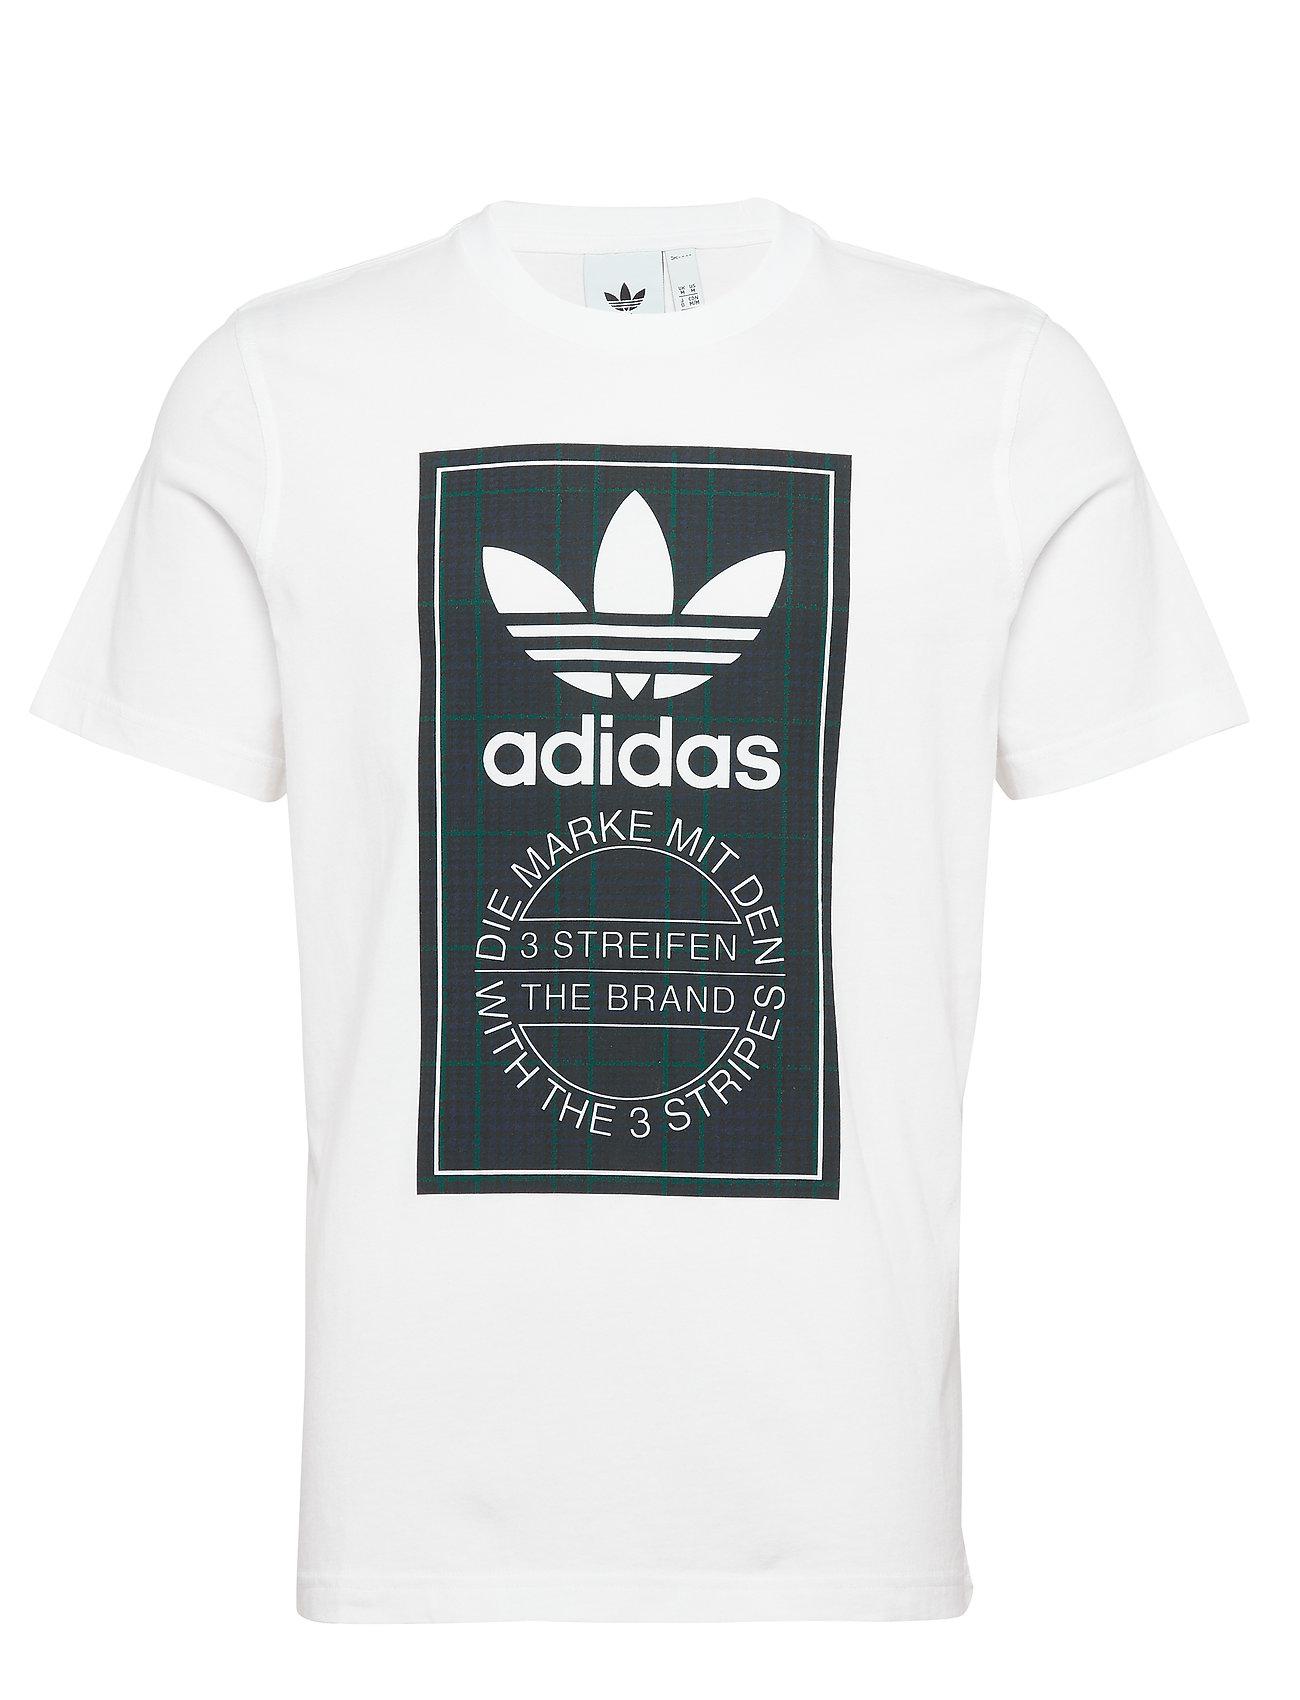 adidas Originals TARTAN TONGUE T - WHITE